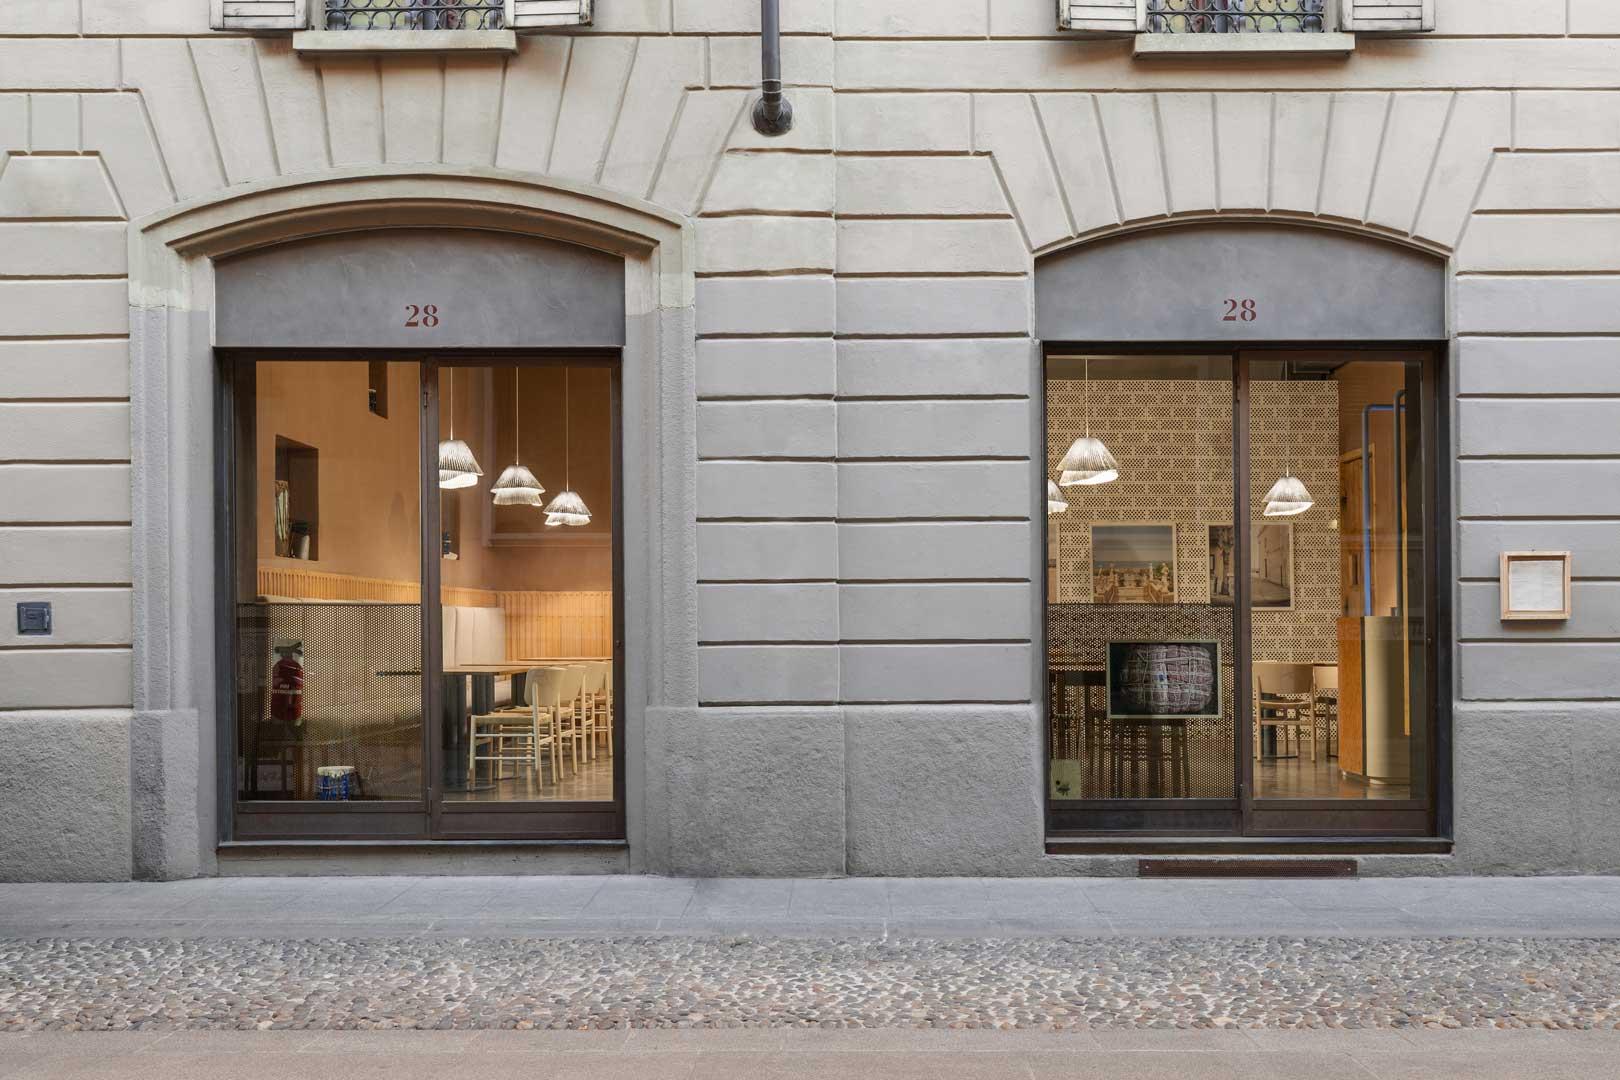 28 Posti - Milano